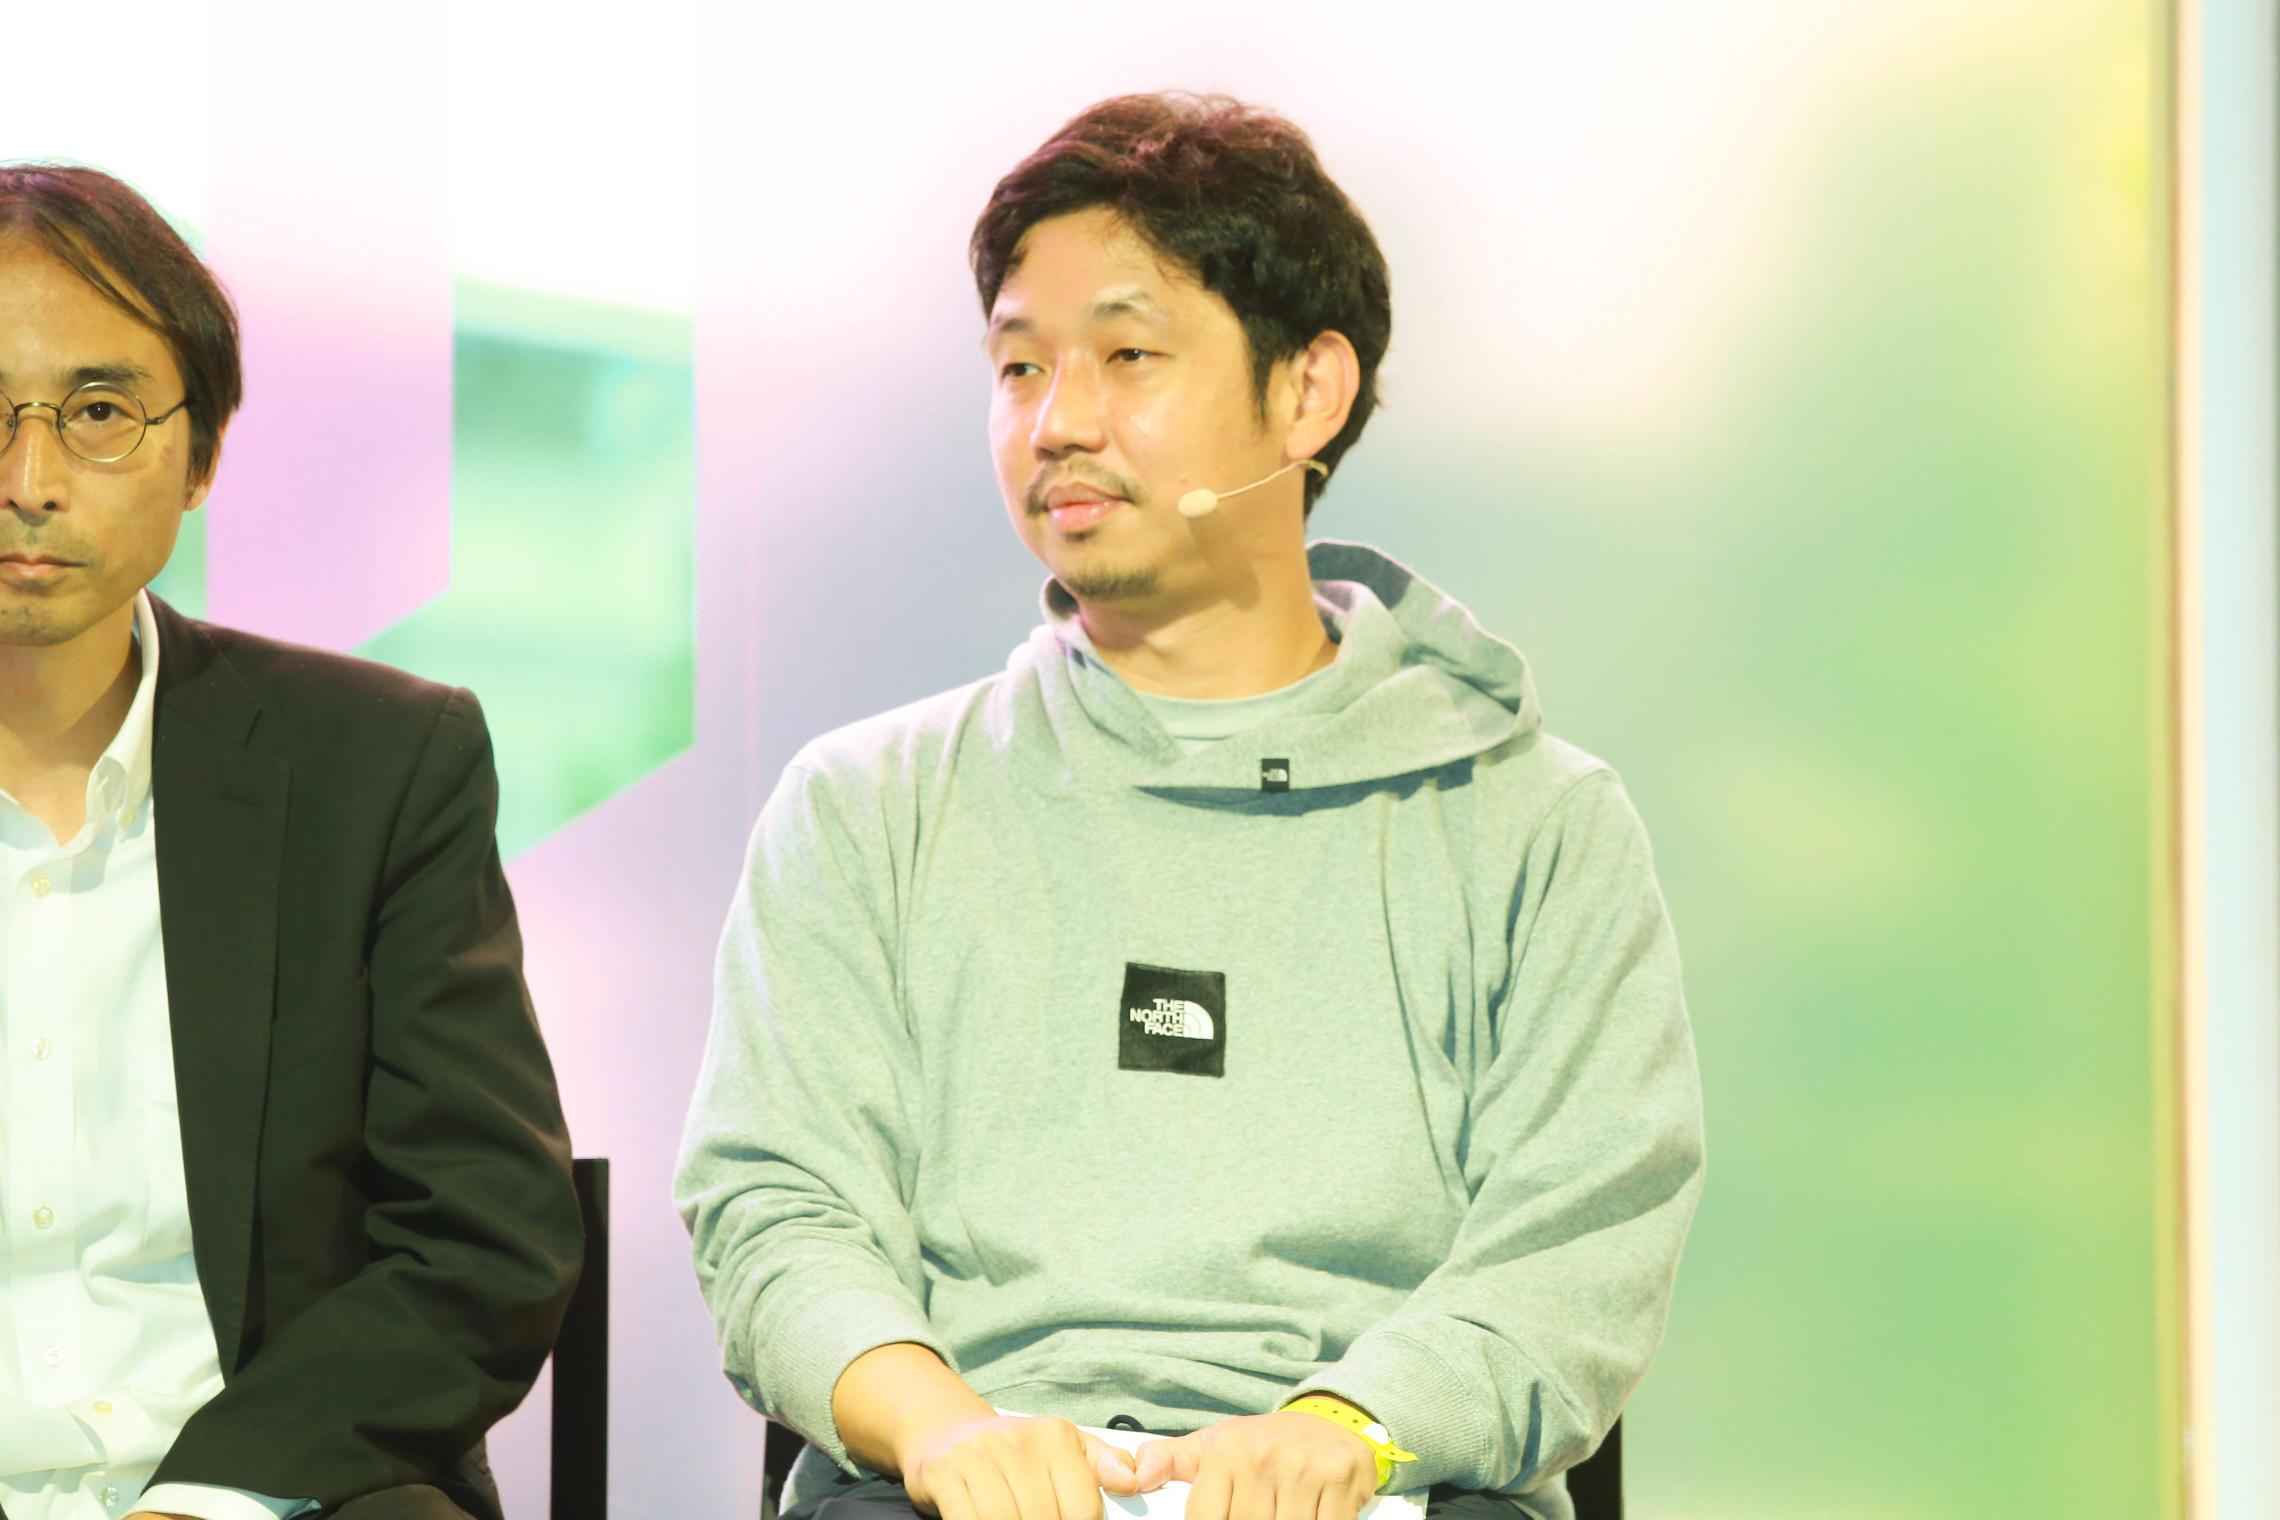 http://news.yoshimoto.co.jp/20180916183058-c7c7a6f85a7c92f817953e9f1469b377ca993fde.jpg